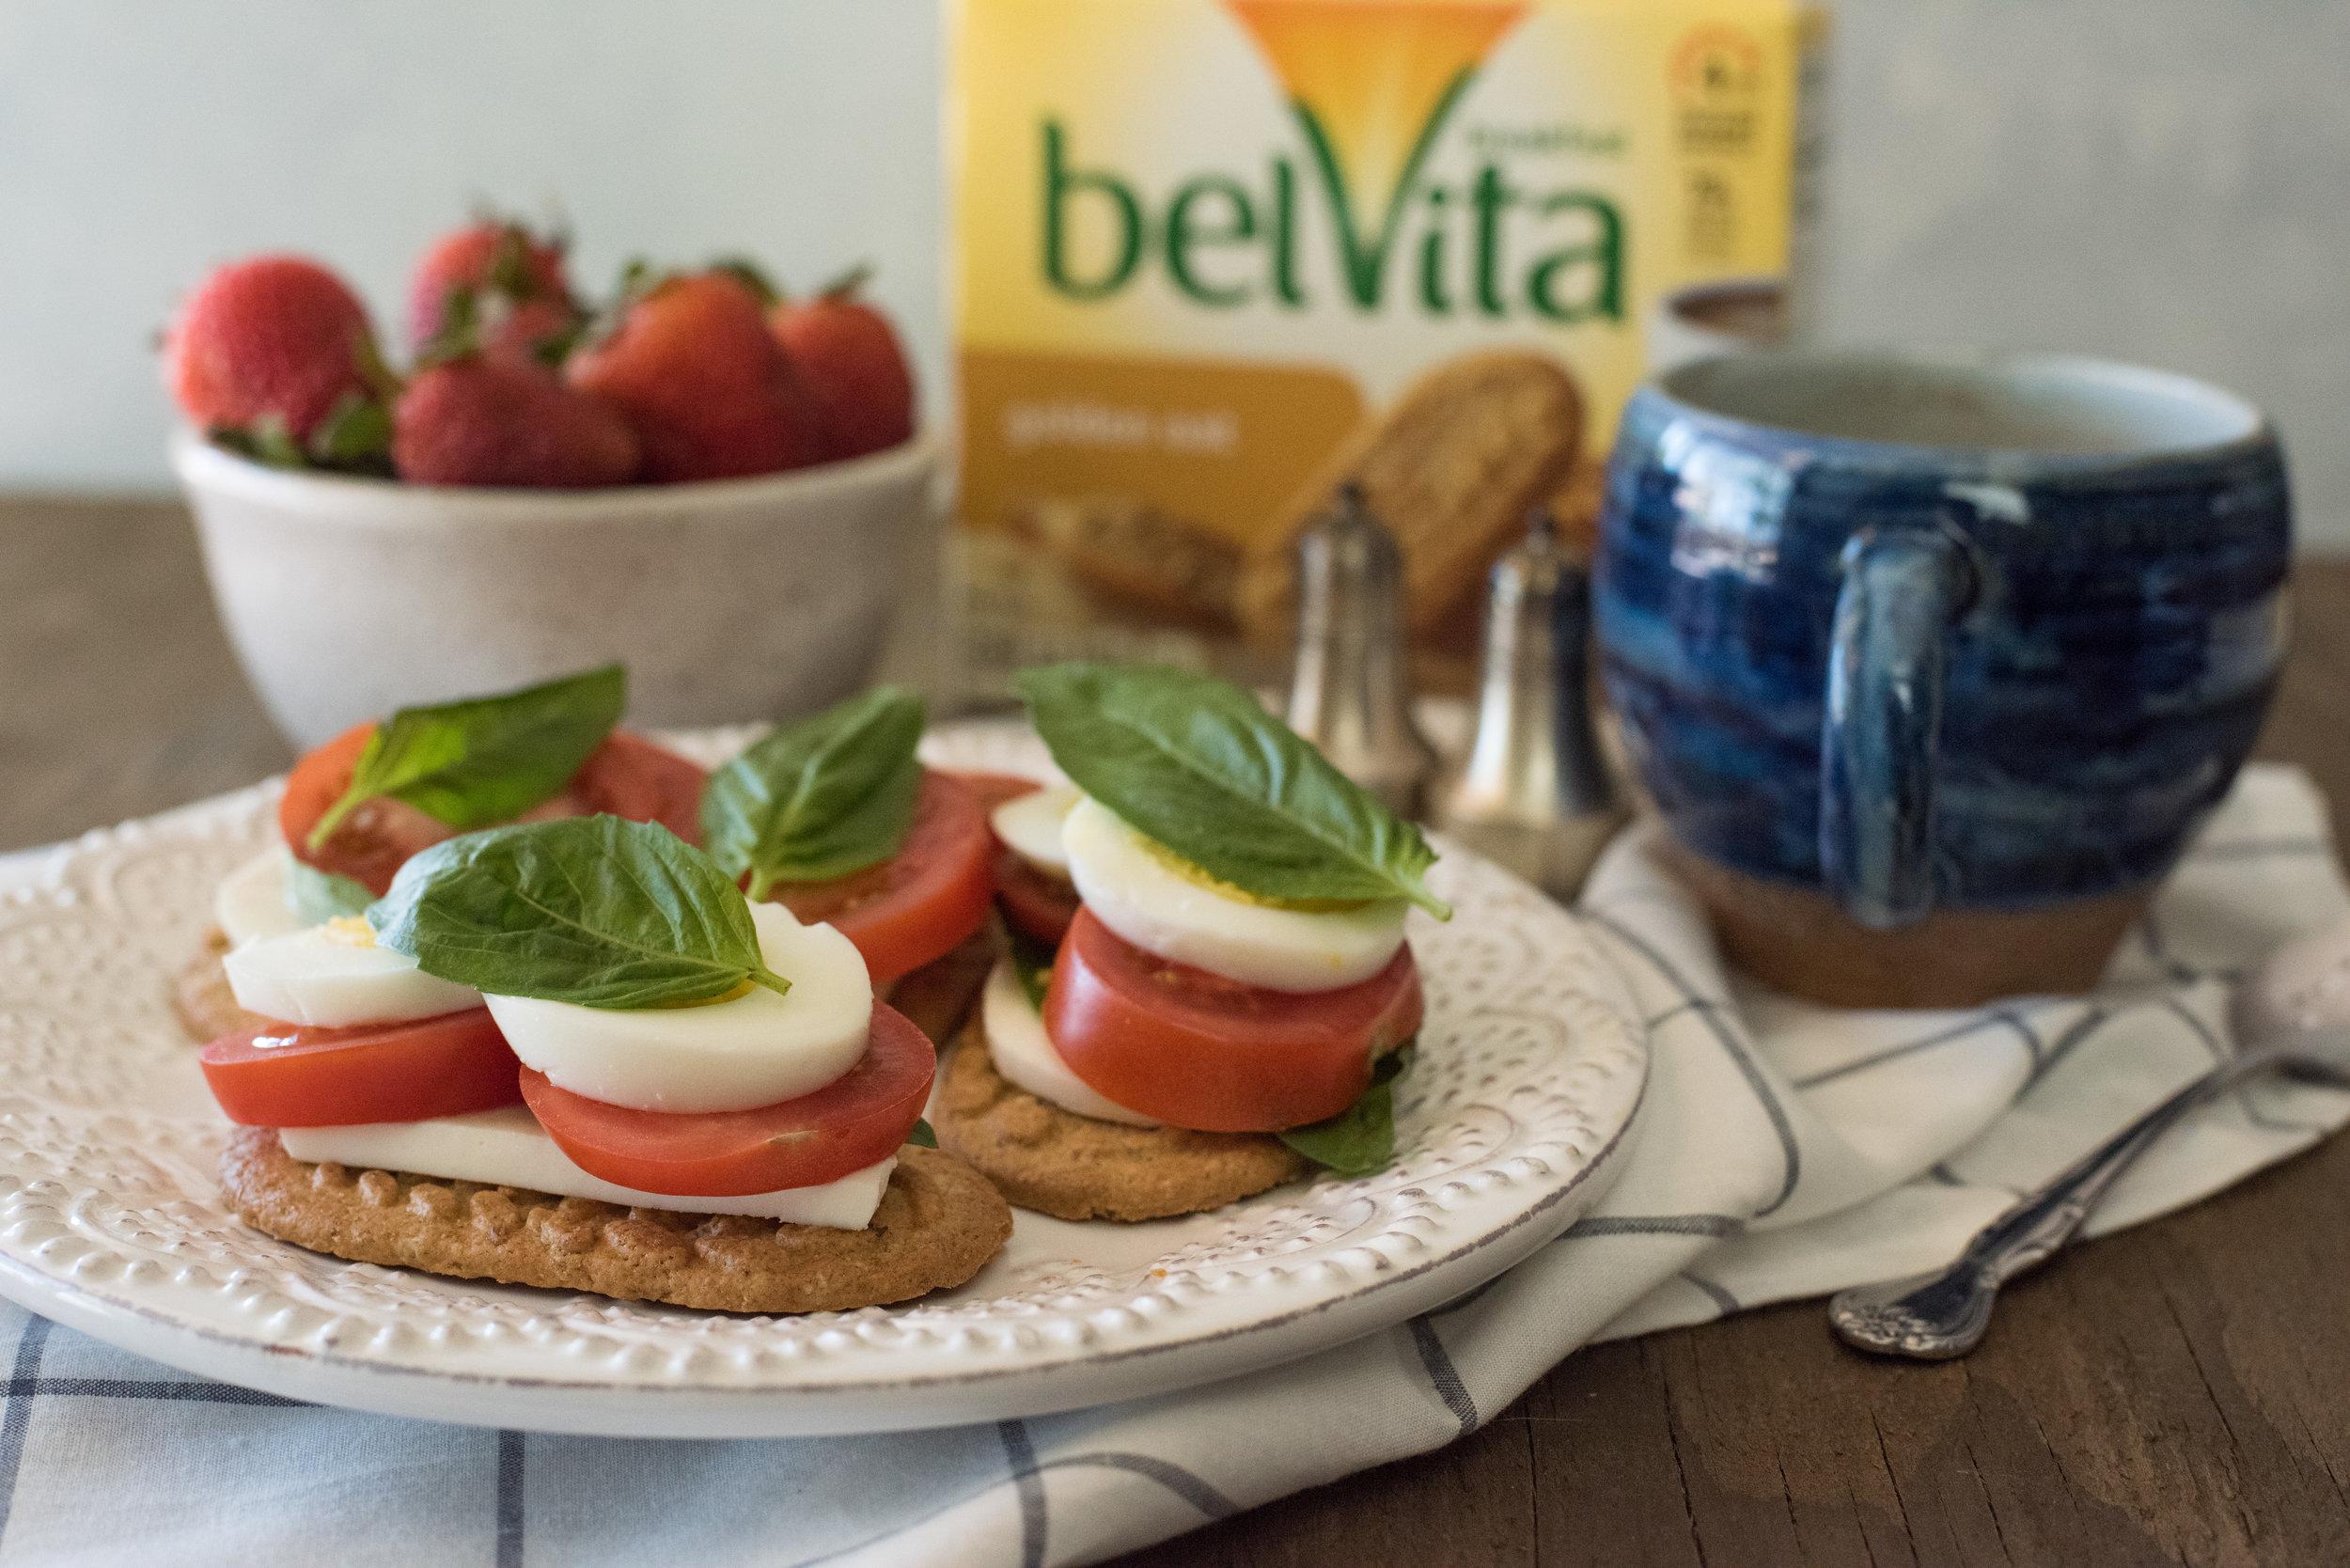 Breakfast stacks with belVita